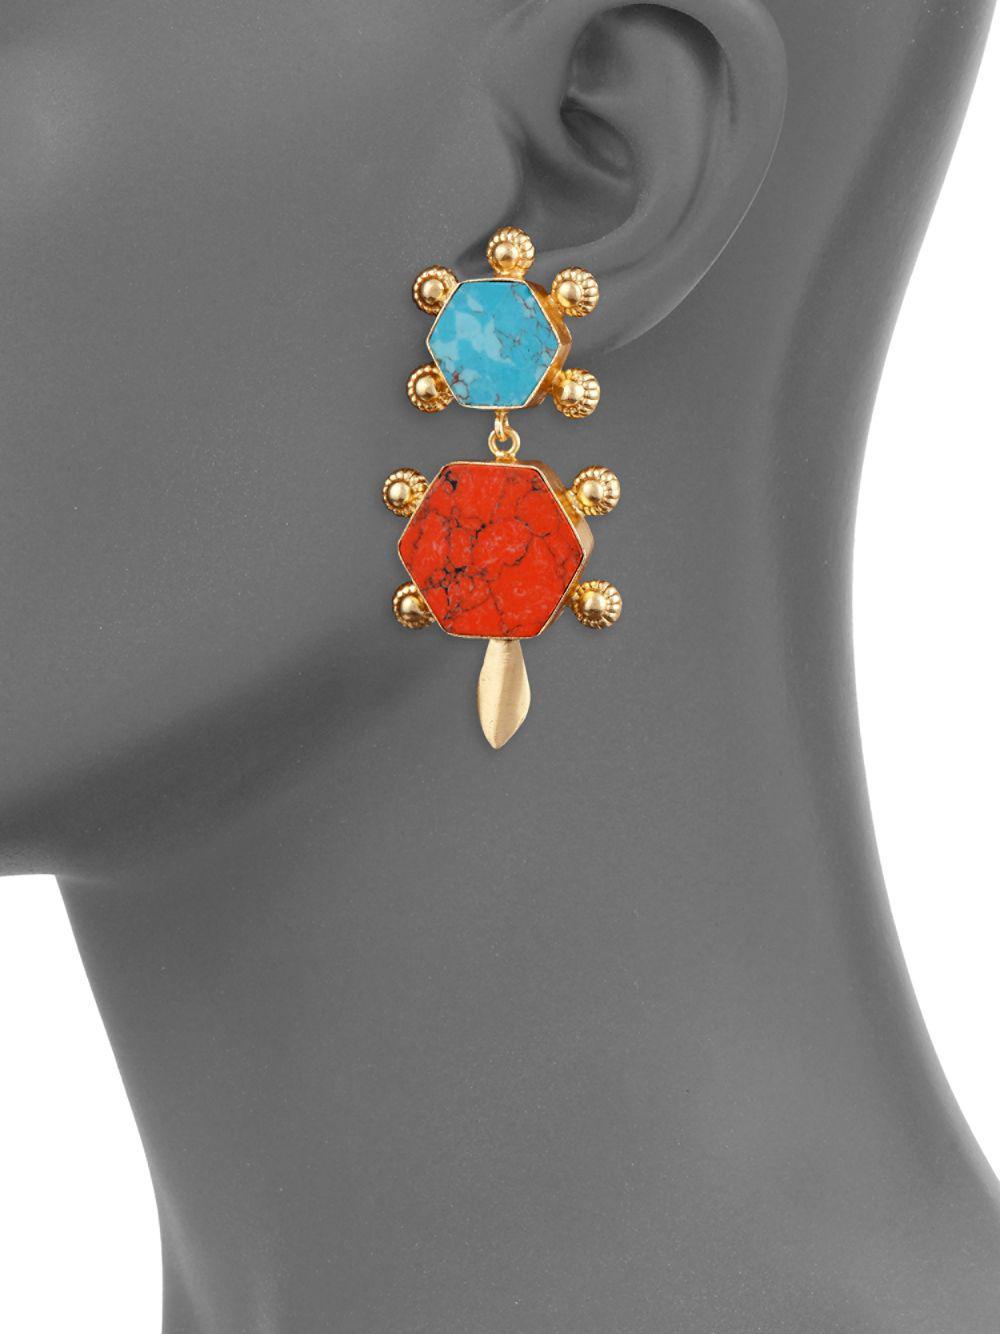 Kenneth Jay Lane Metallic Turquoise Statement Earrings Lyst View Fullscreen